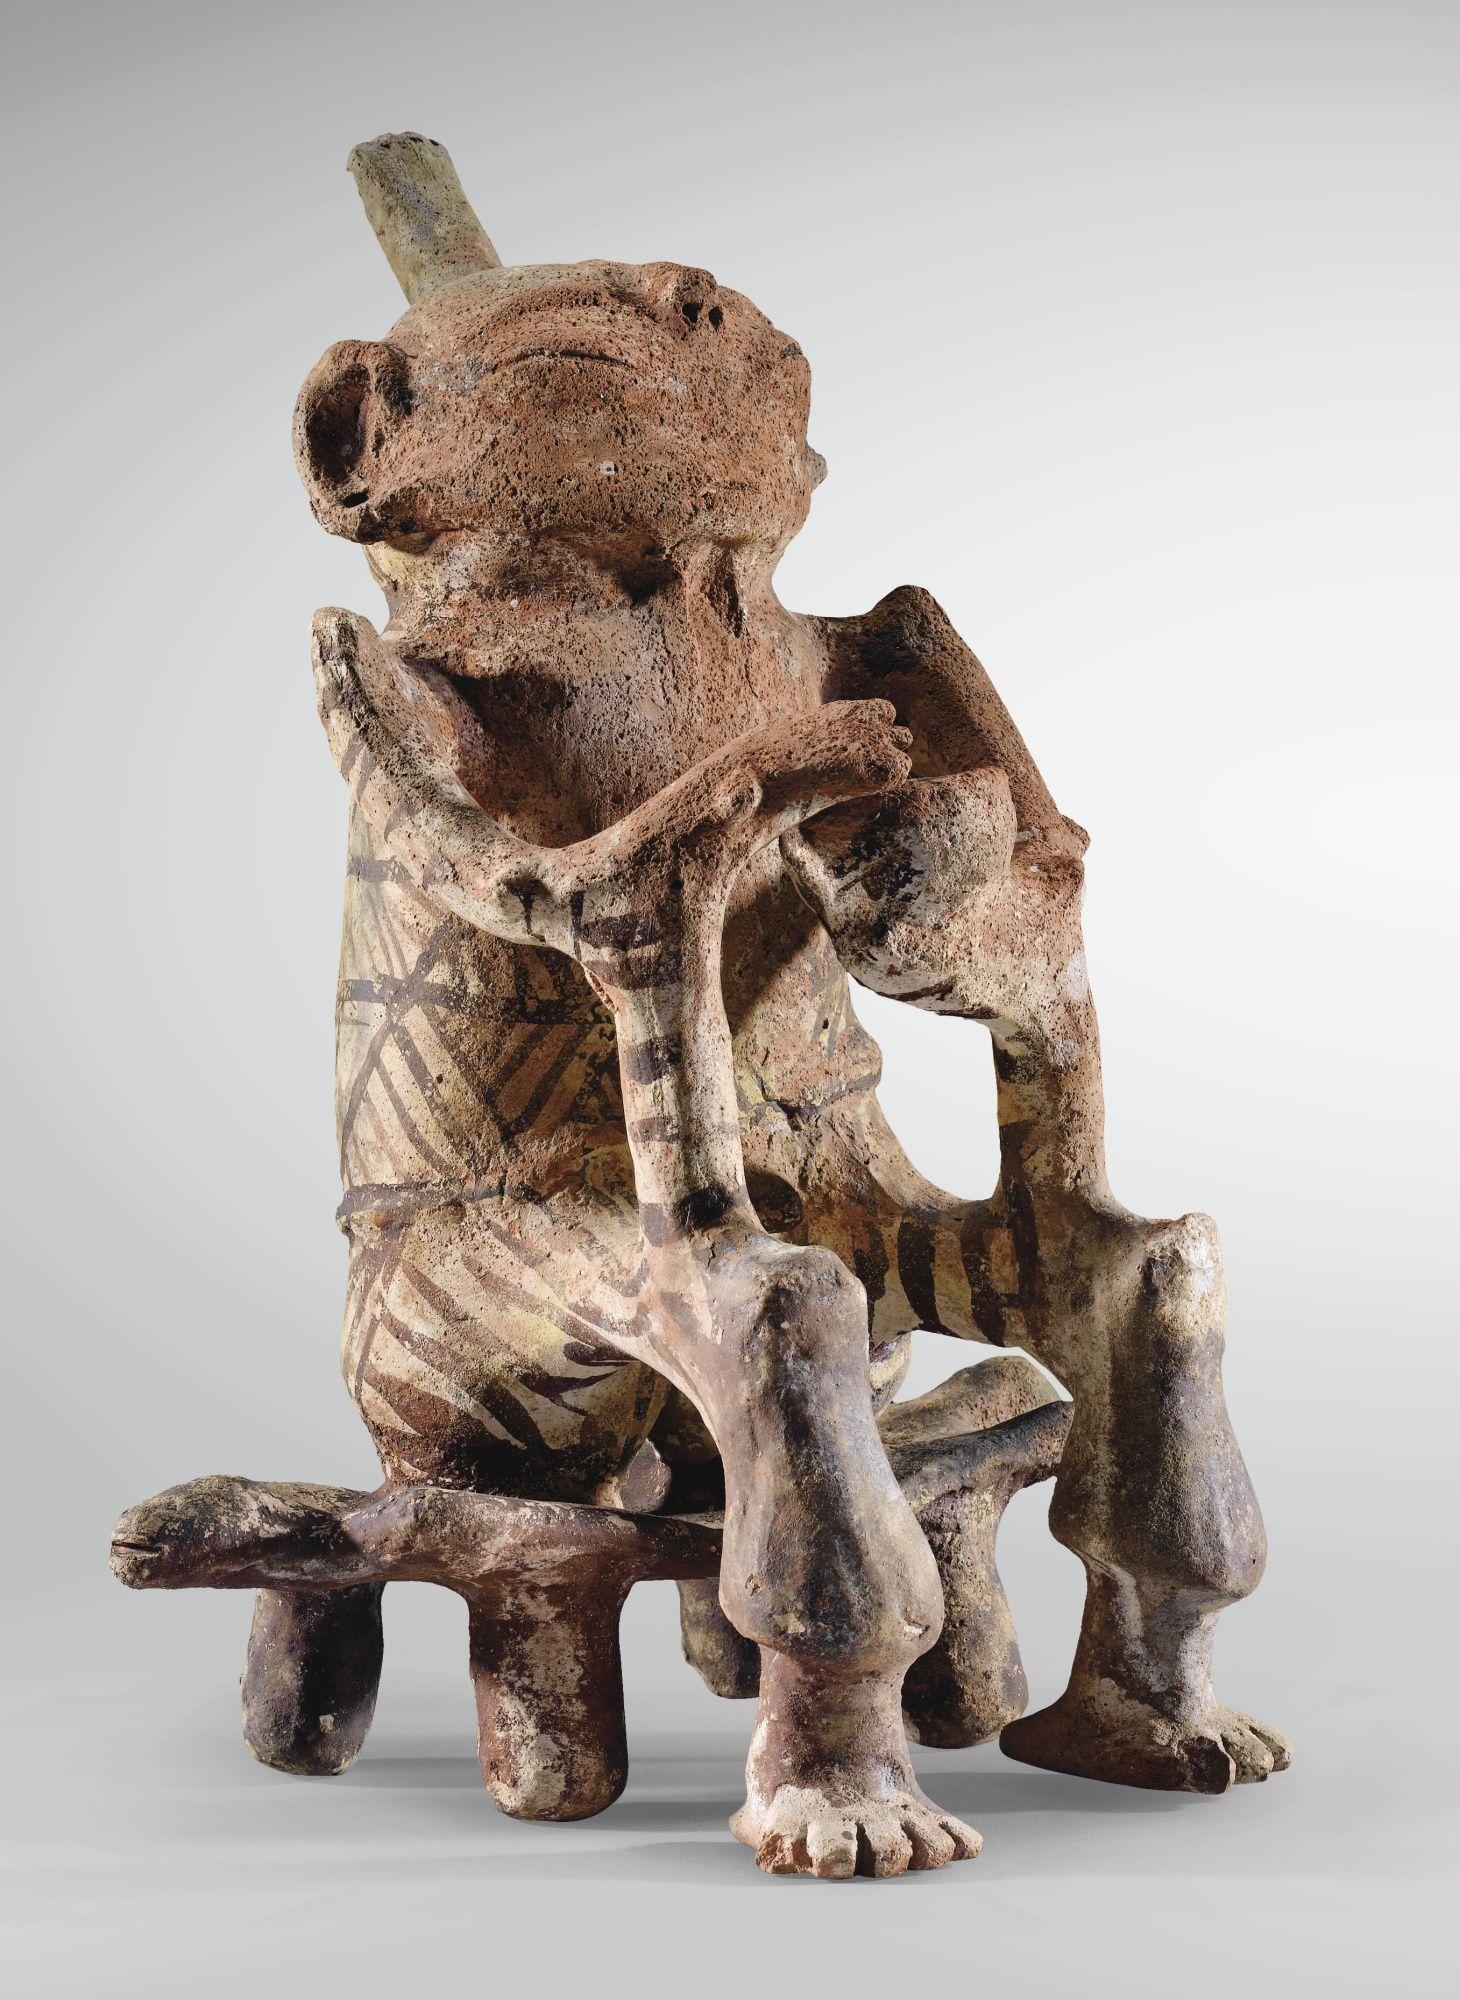 Sotheby's - FIGURINE MASCULINE ASSISE SUR UN PETIT BANC CULTURE TRUJILLO ETAT DE TRUJILLO, VENEZUELA 1300-1500 AP. J.-C. TRUJILLO SEATED FIGURE, VENEZUELA